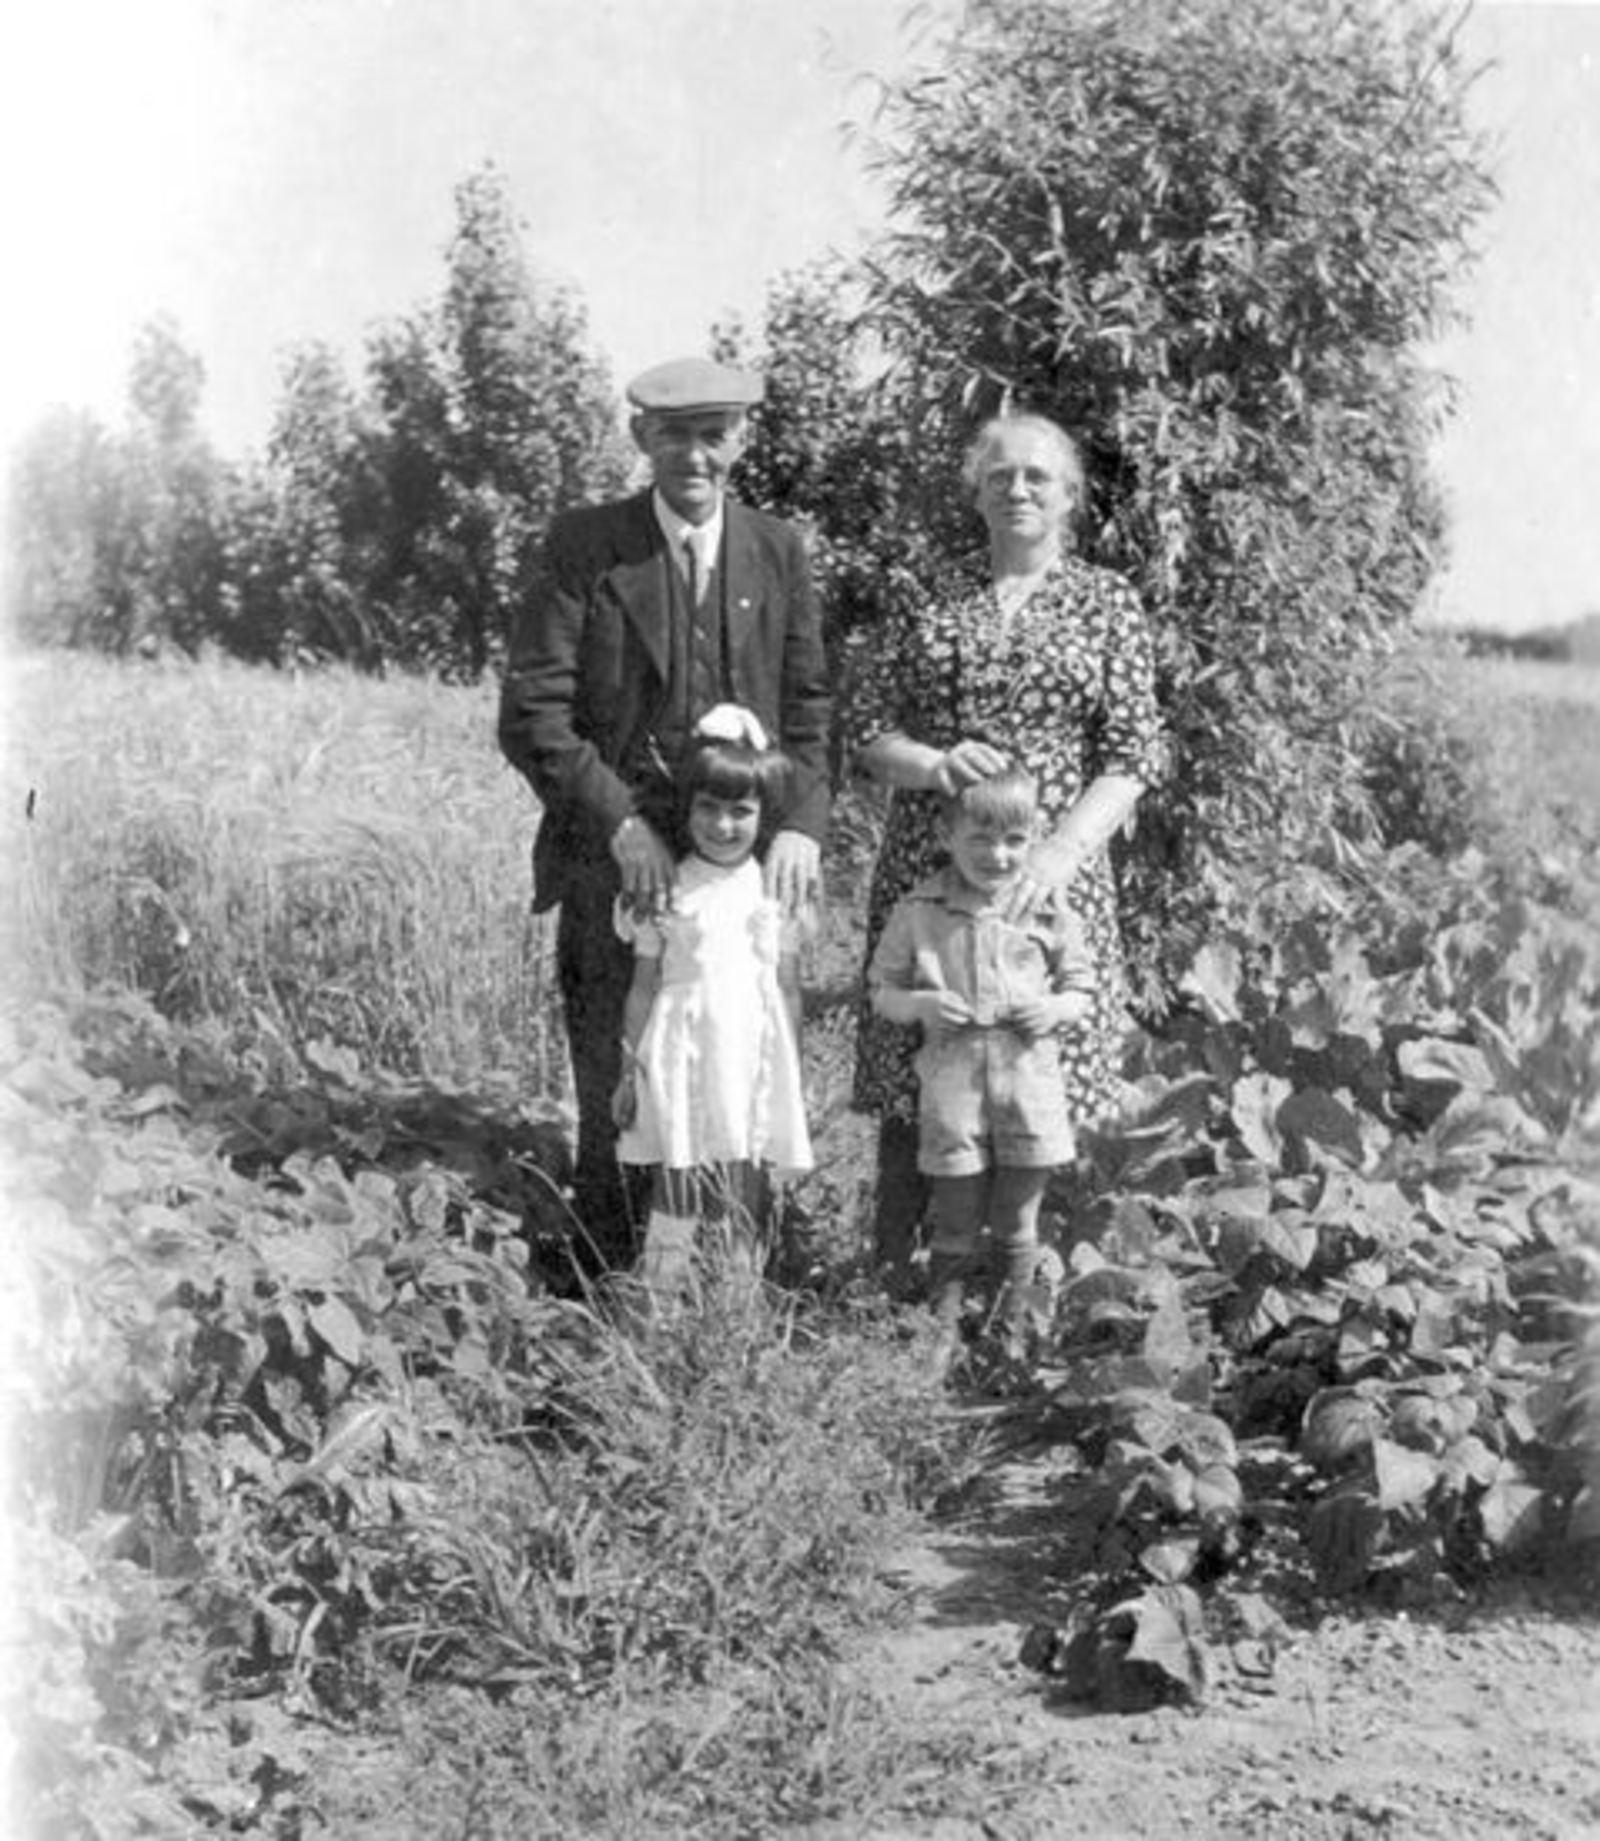 Groef Abraham vd 1882 19__ met Familie in Tuin 01